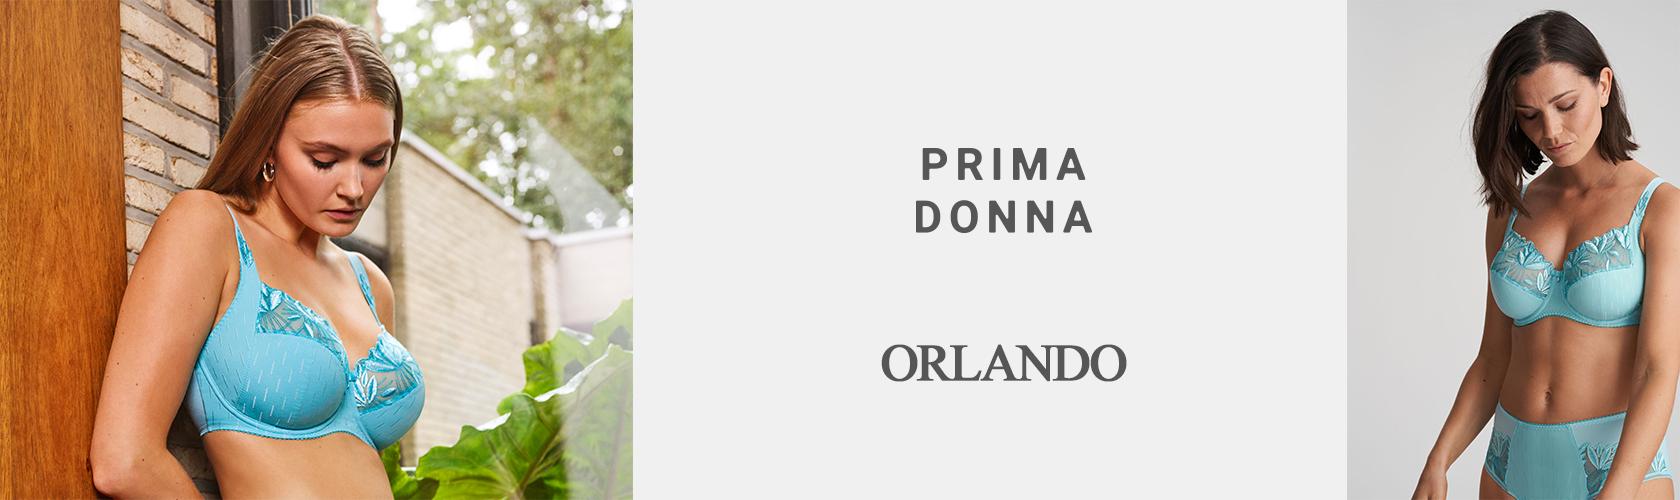 2020000933 Slideshow Orlando JBU 30.03.2021